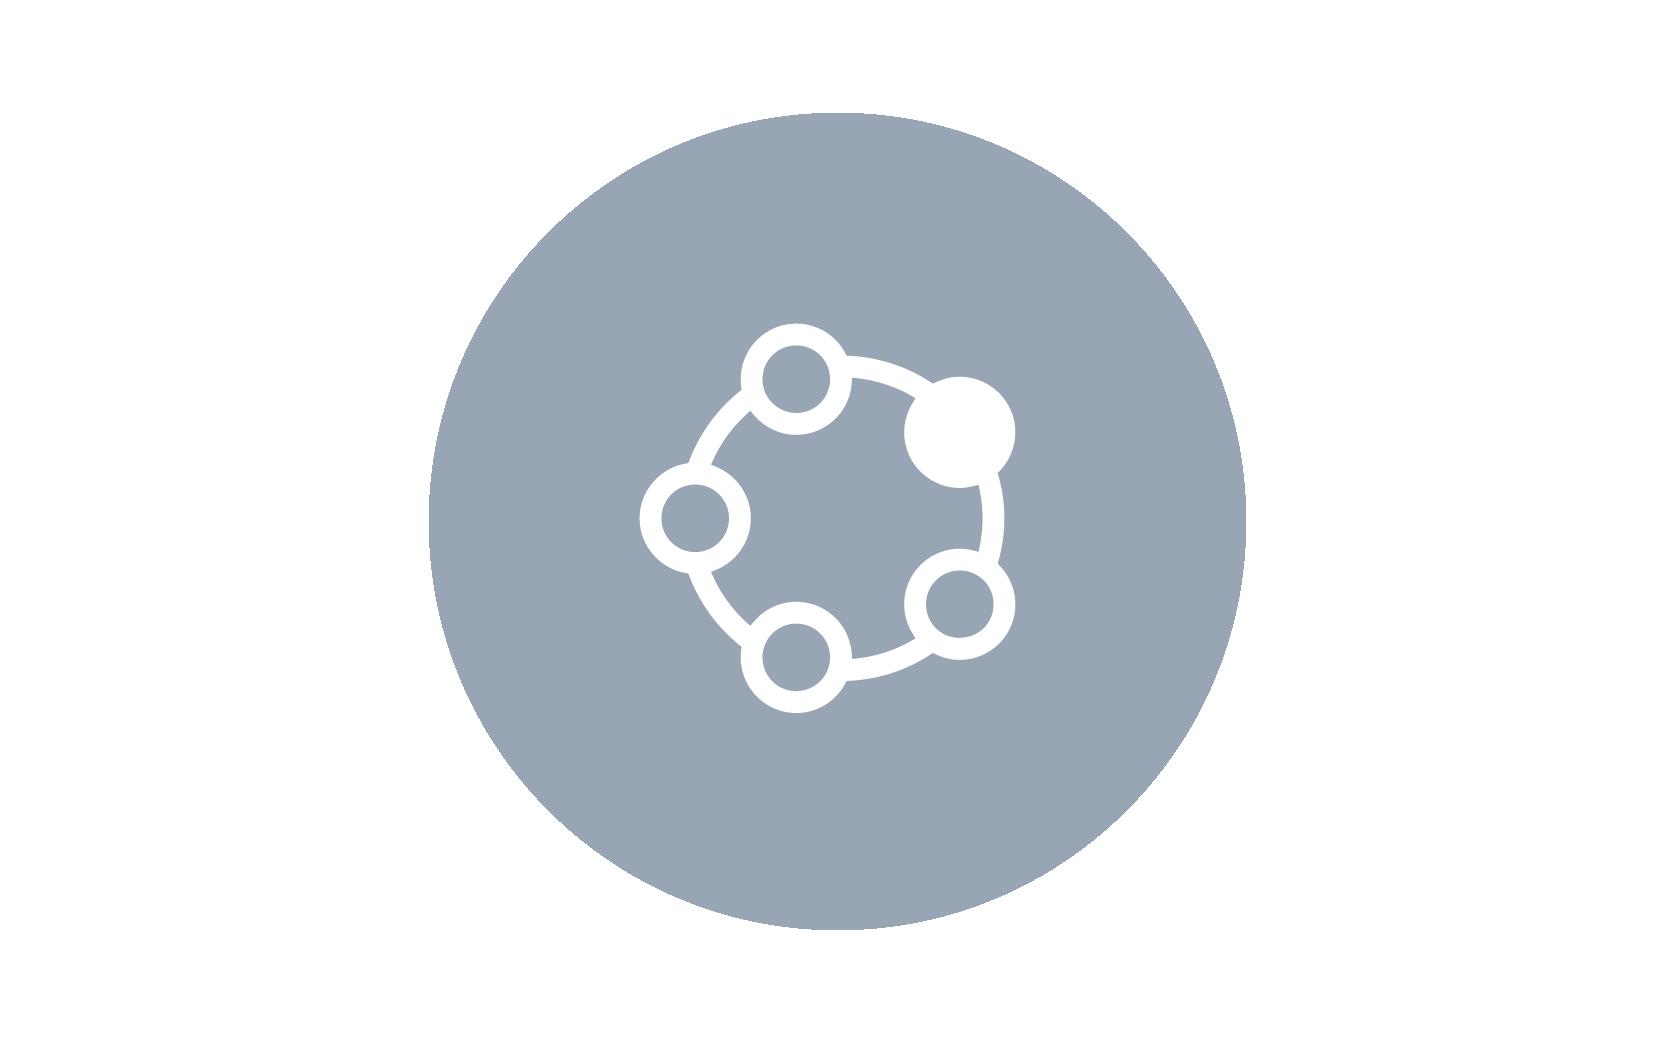 BGP Site Vector Assets-07.png